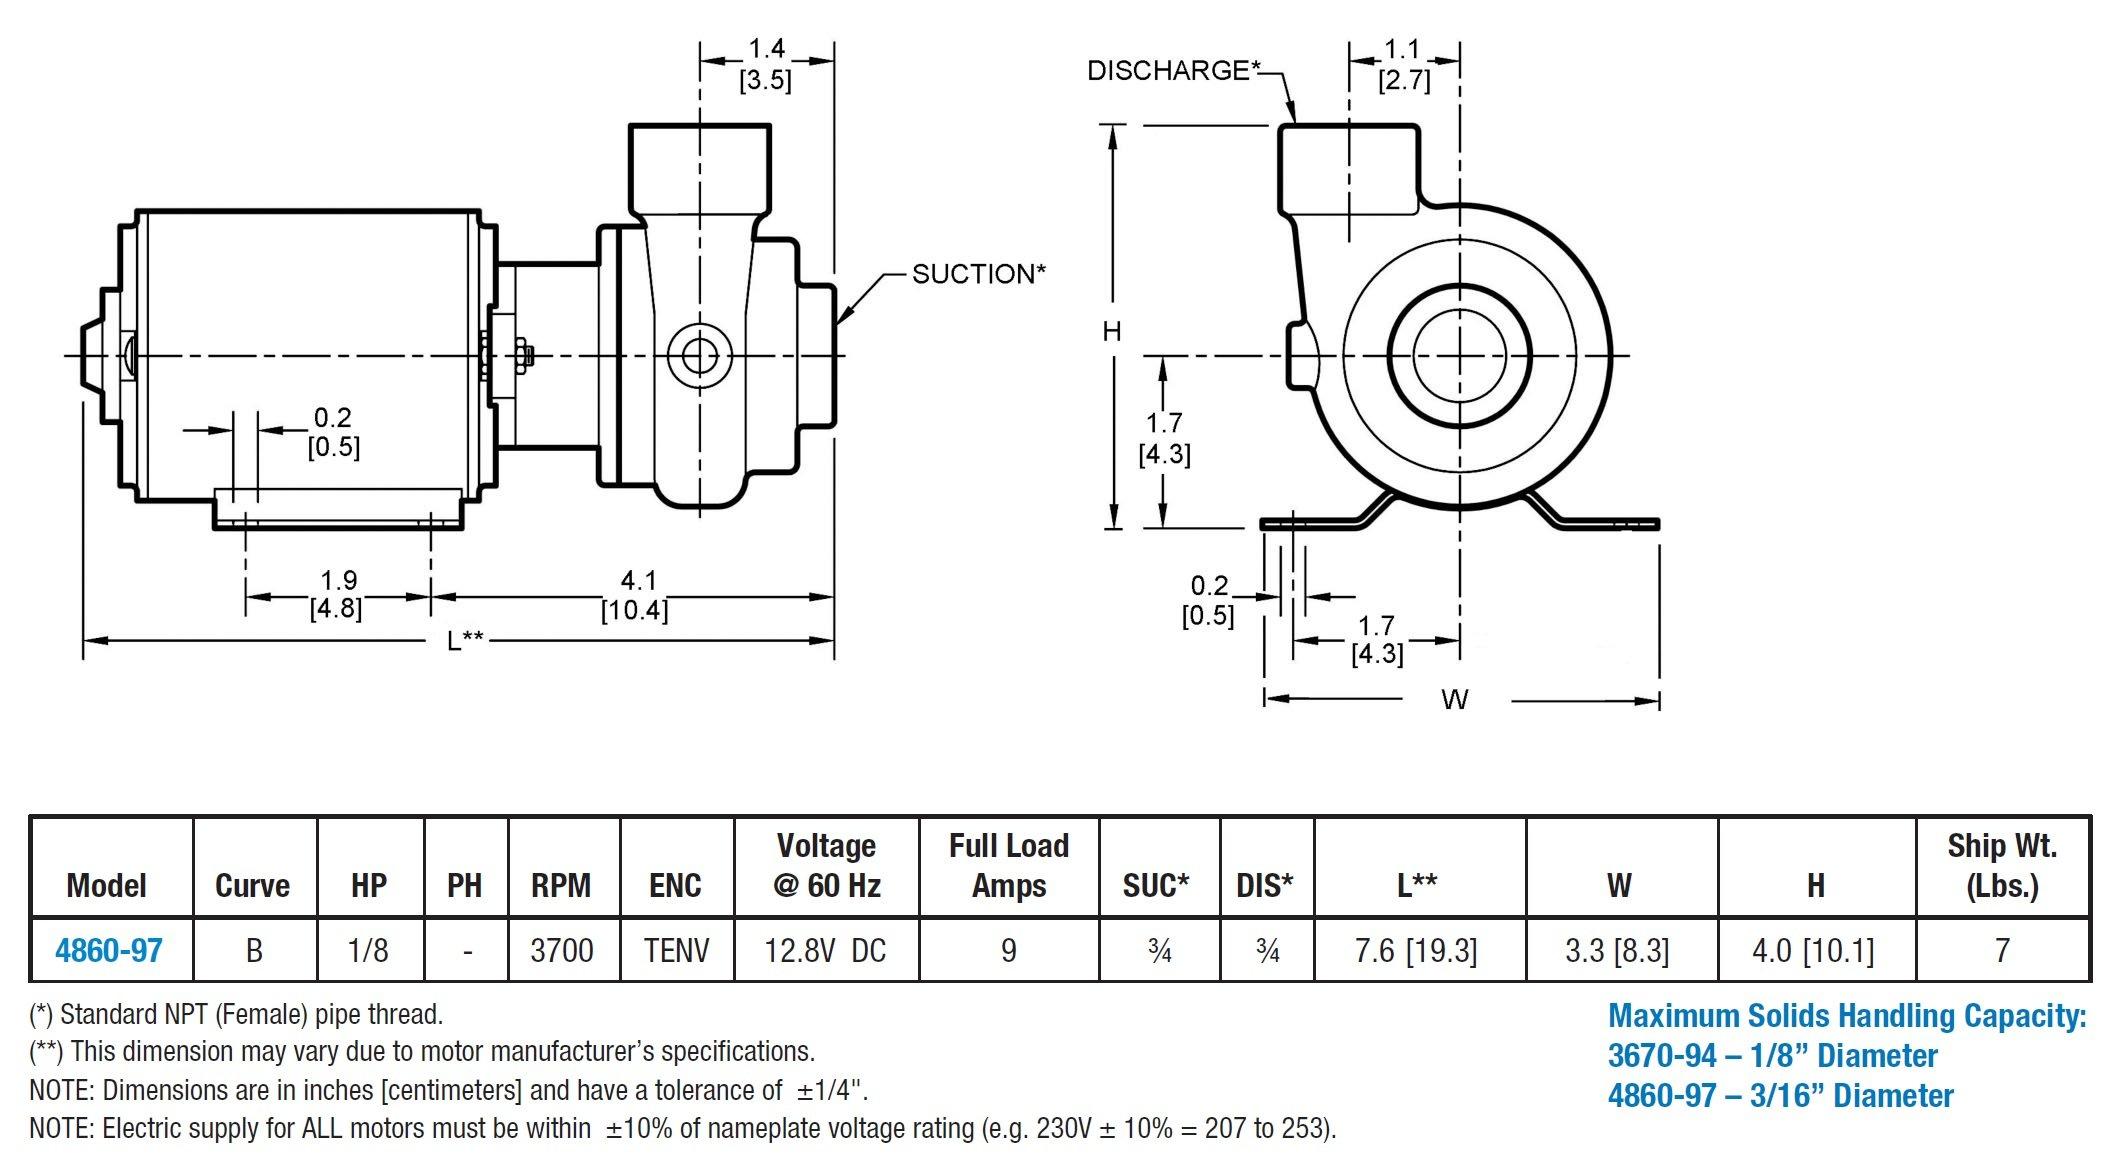 AMT Pump 4861-97 Marine Pump, Bronze, 1/8 HP, 12V DC TENV Marine Motor, 3/4'' NPT Female Suction & Discharge Ports